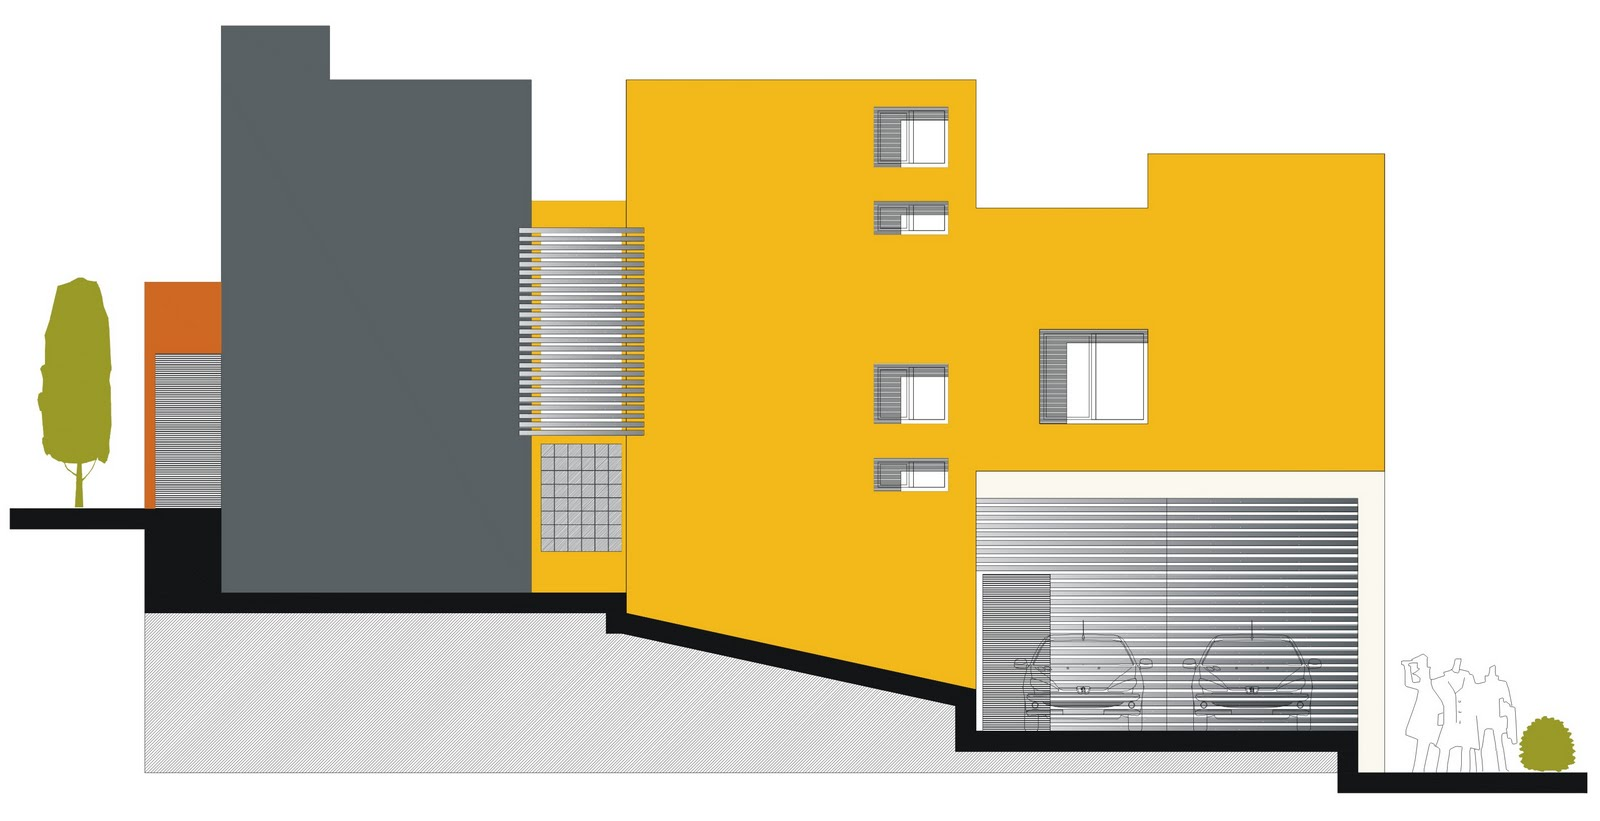 Dibujos y proyectos arq francisco a proyecto for Fachadas de departamentos pequenos